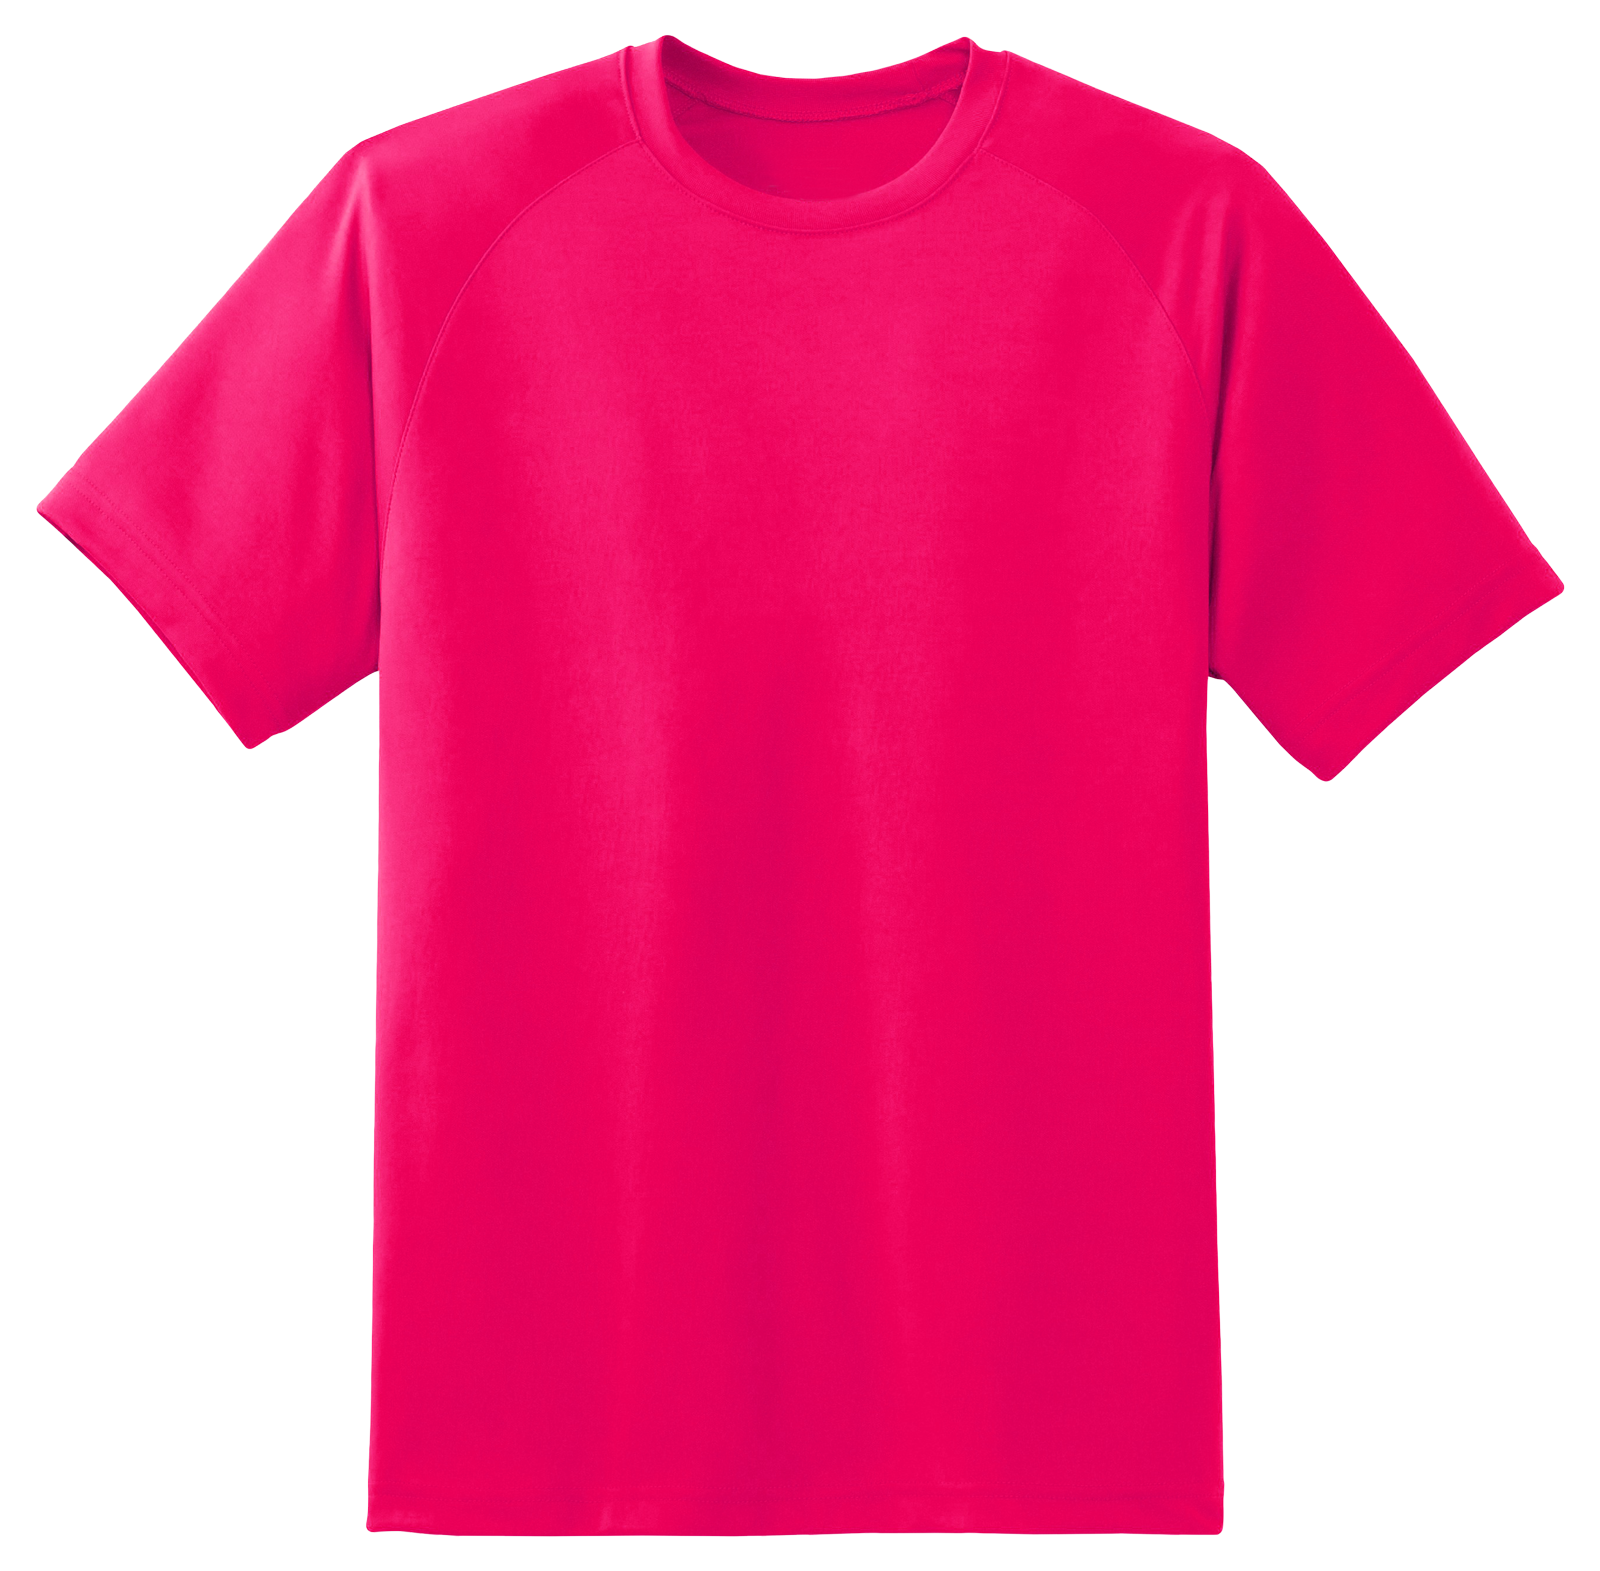 T Shirt PNG Image